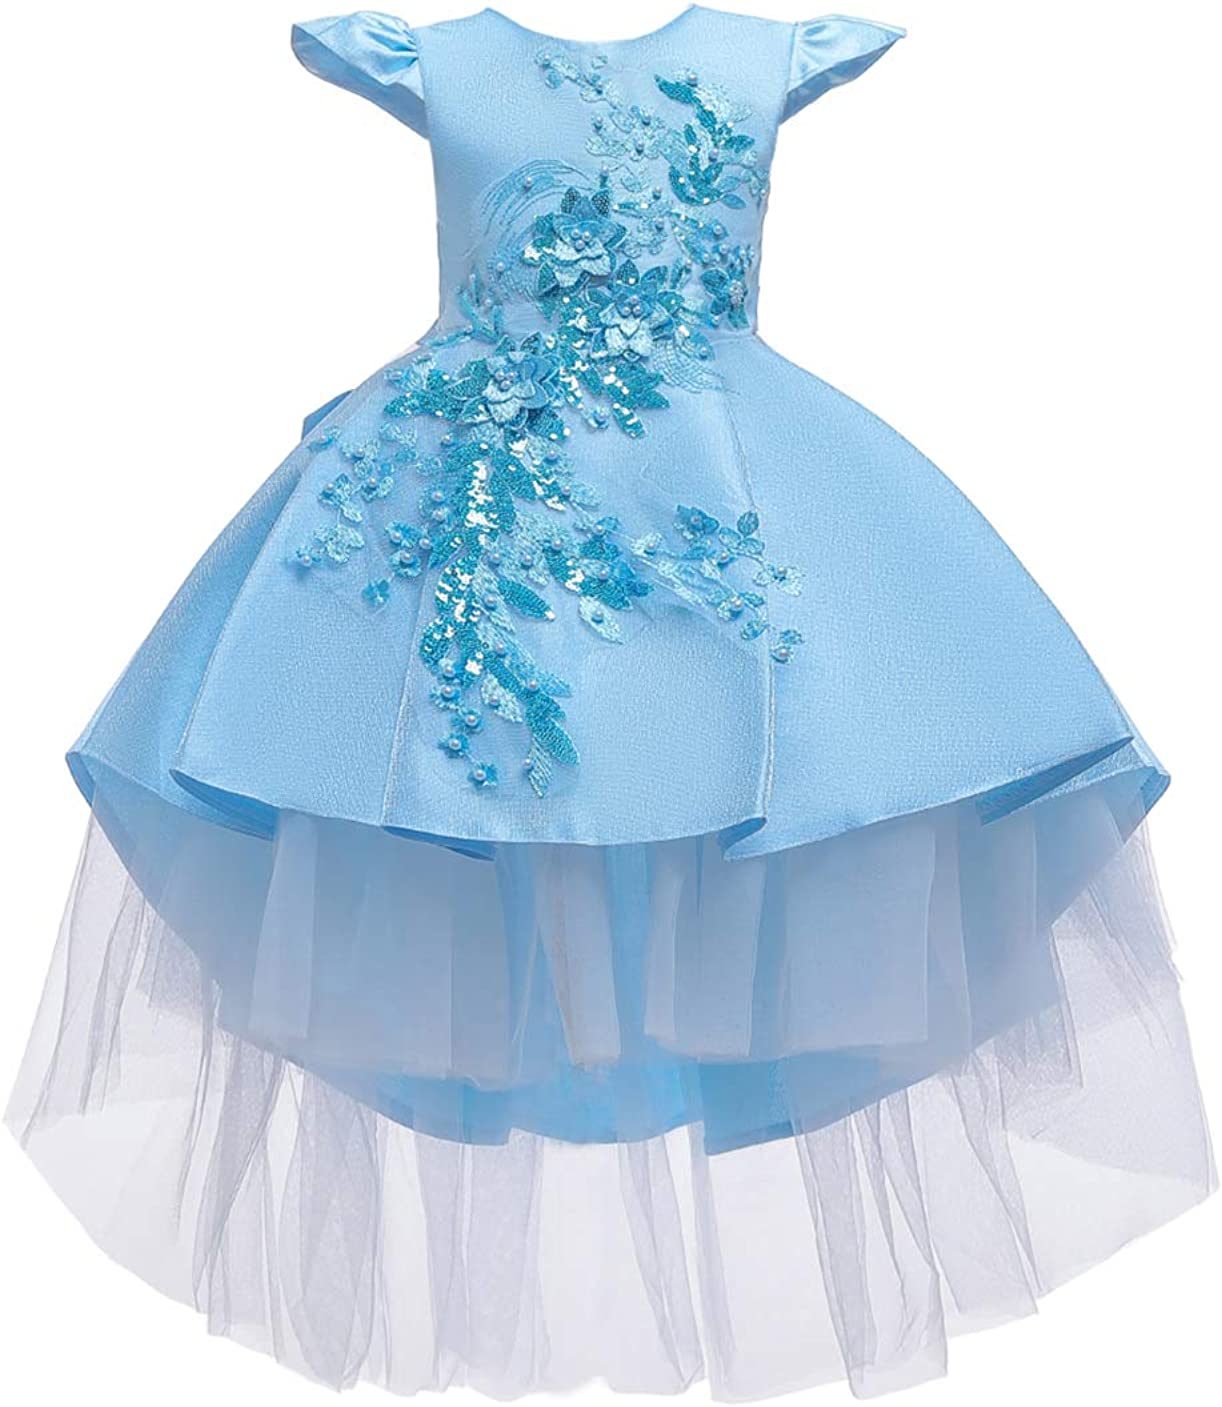 GRASWE Kids Ruffles Lace Party Wedding Dress Girls Pageant Flower Sequin Dress